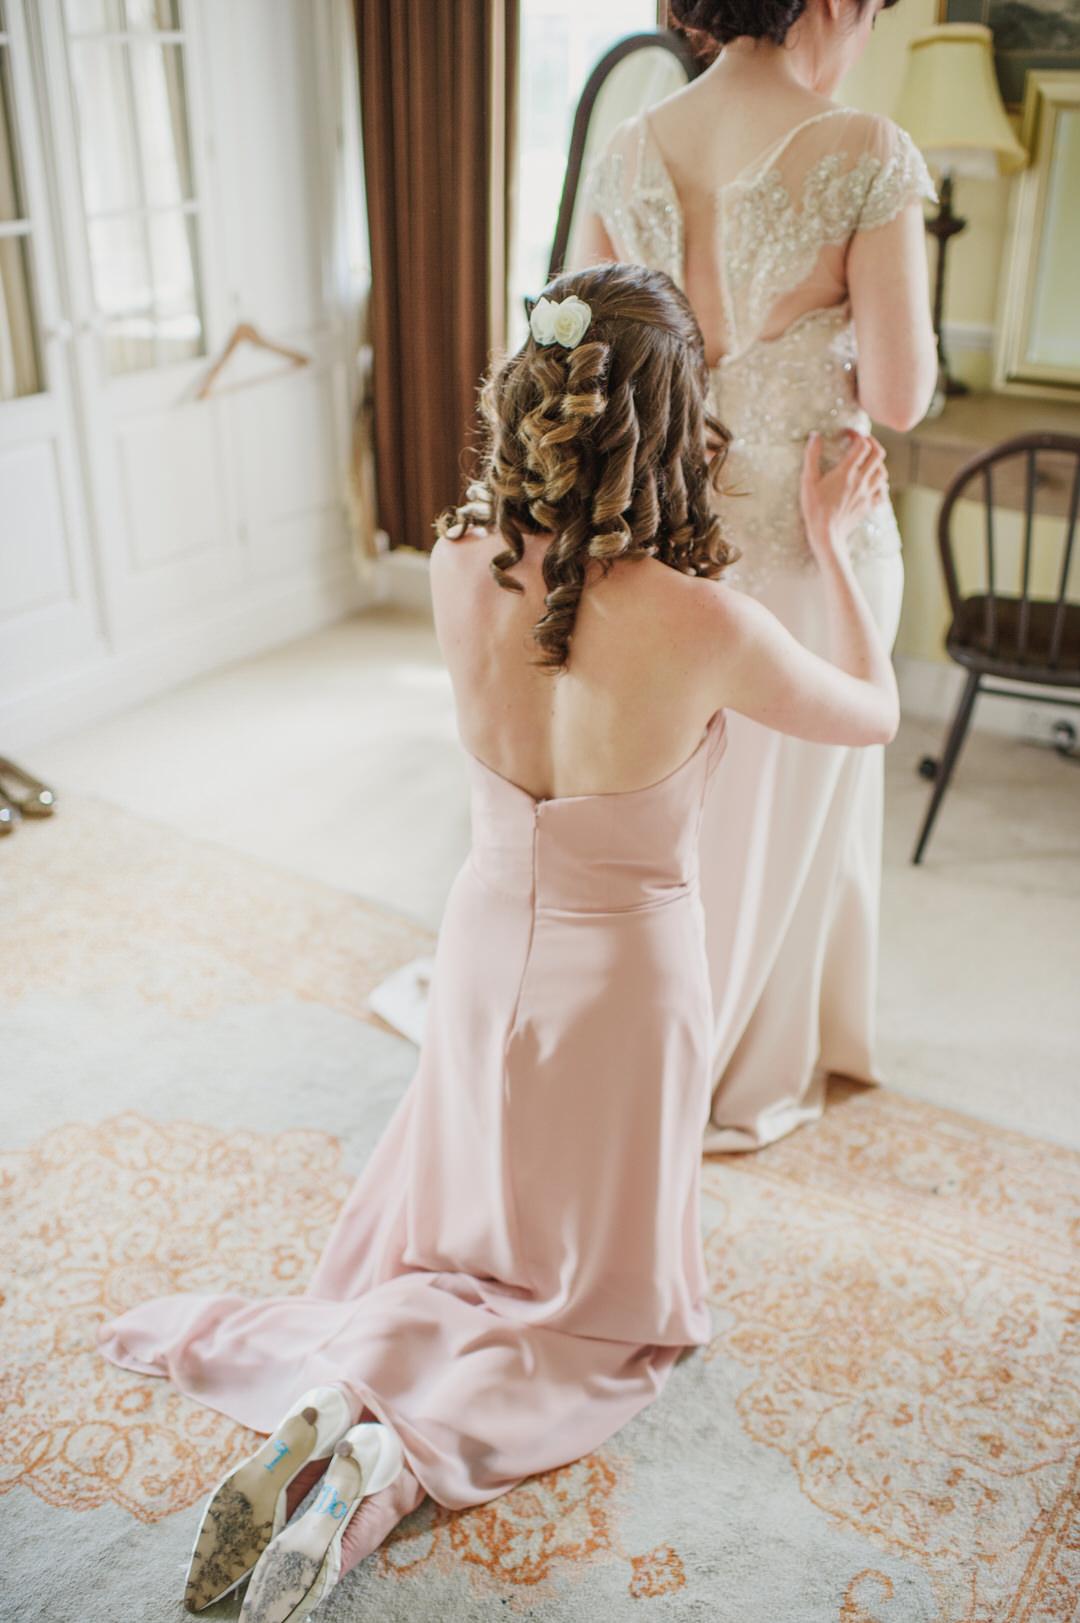 Karen-Flower-Herons-Farm-wedding-1013